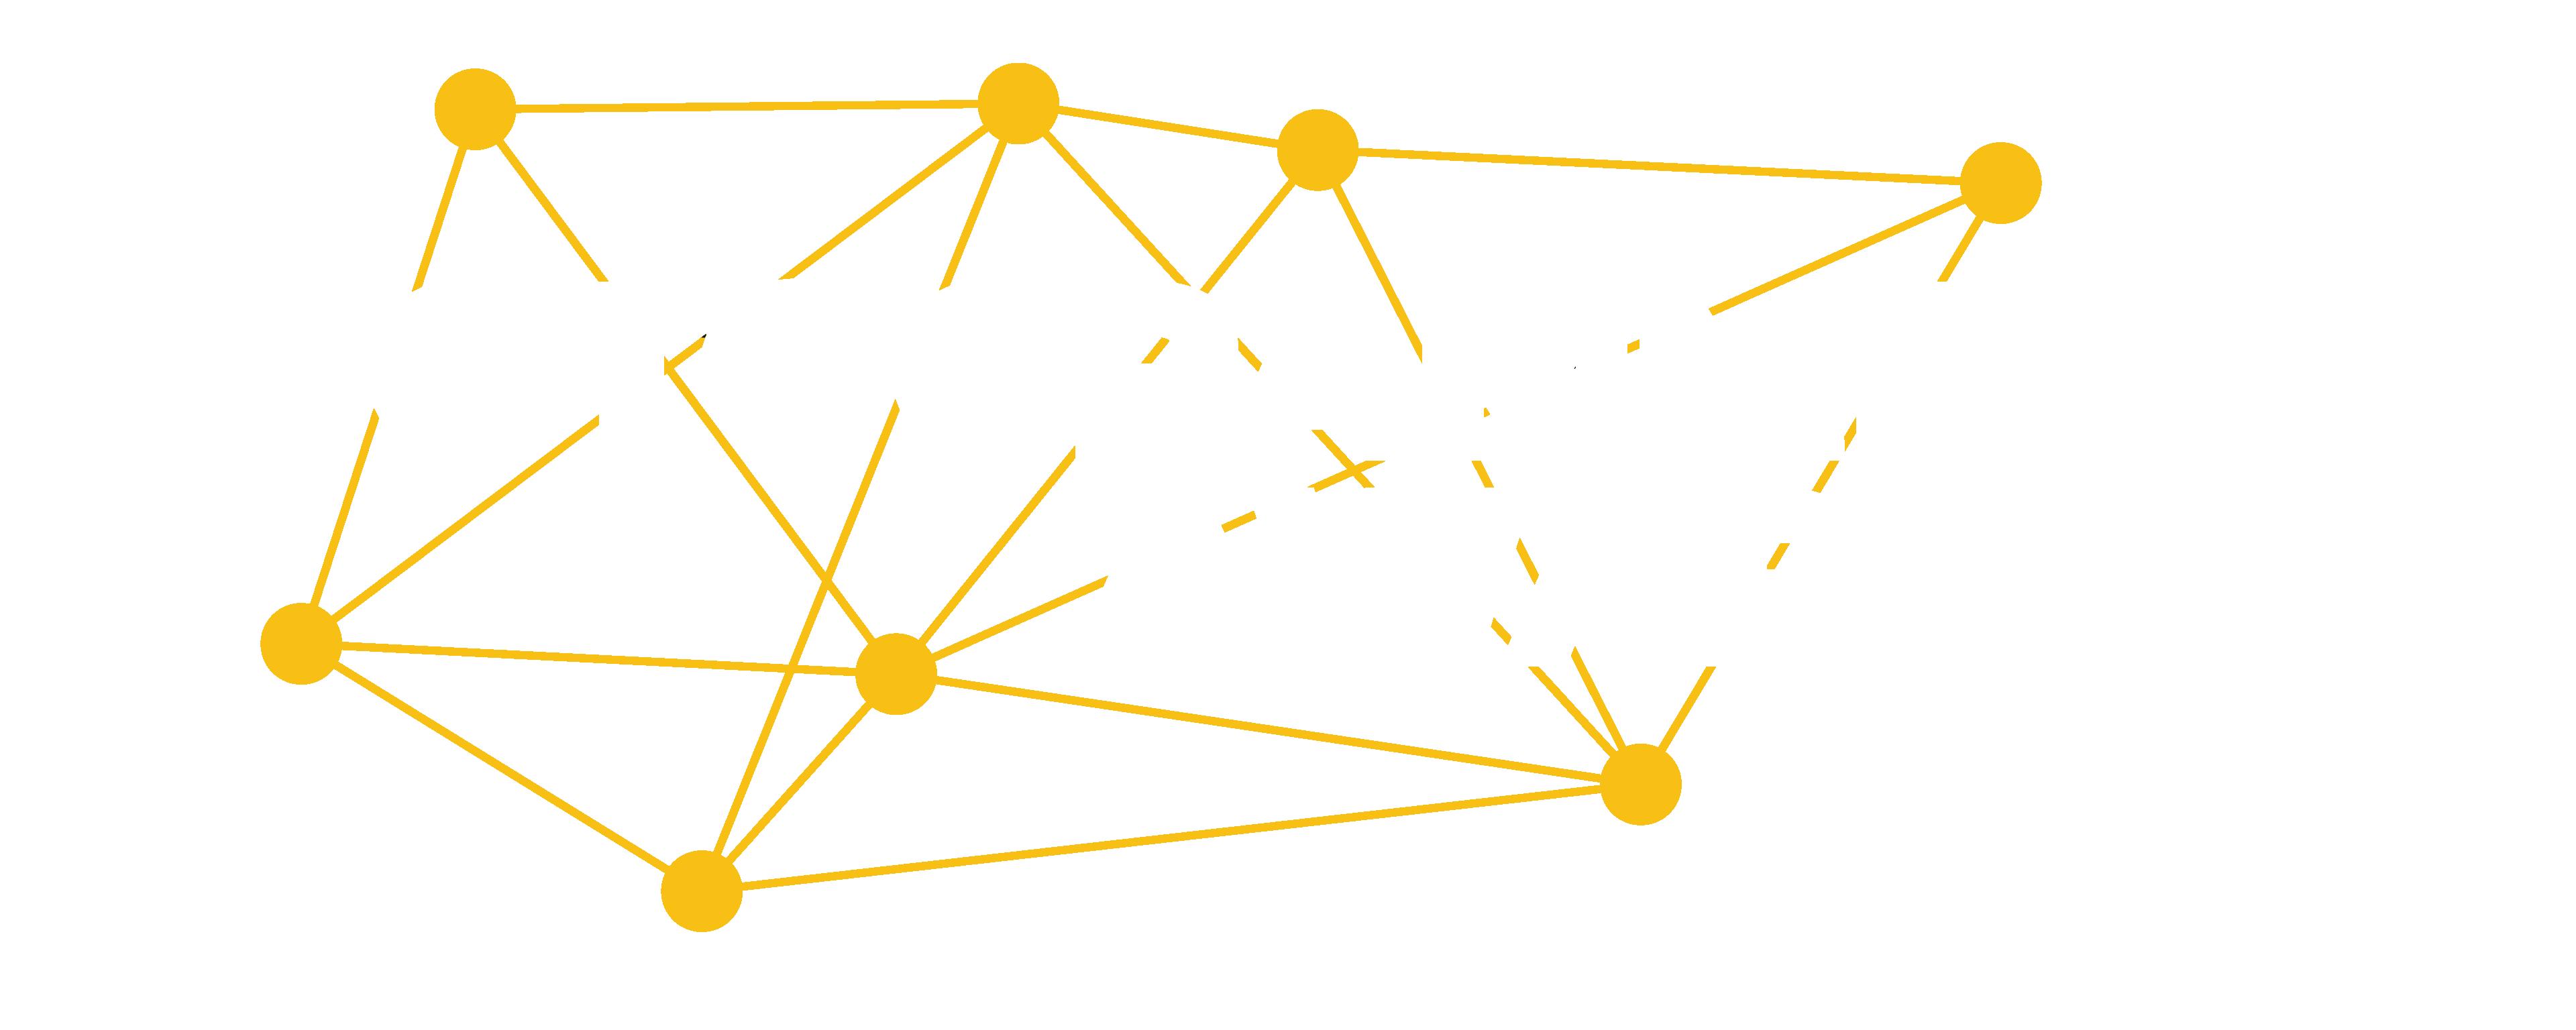 logo-sensefly-and-pix4d-photogrammetry-awards